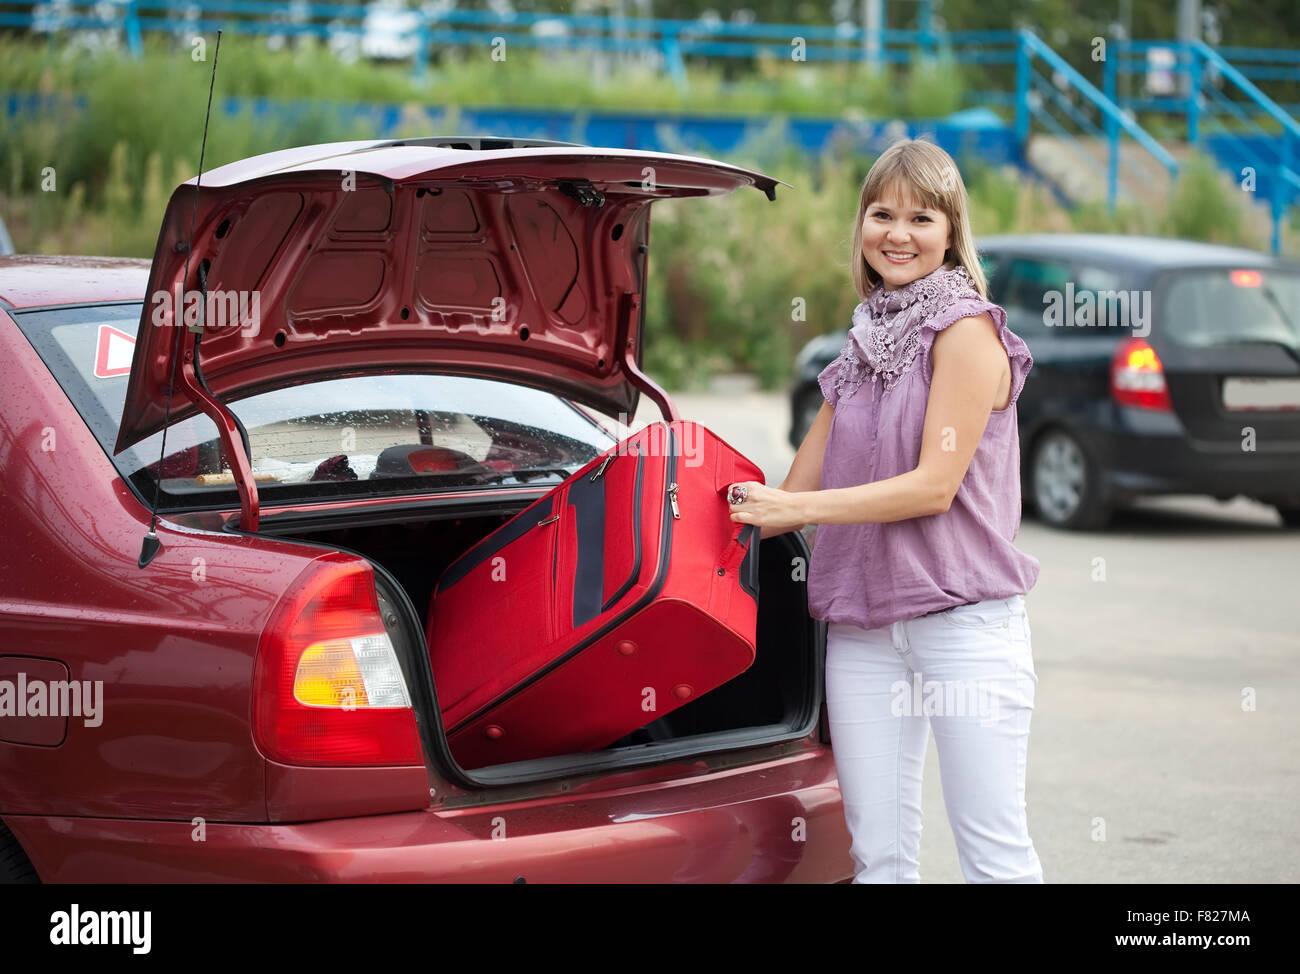 Suitcases Car Stockfotos & Suitcases Car Bilder - Alamy